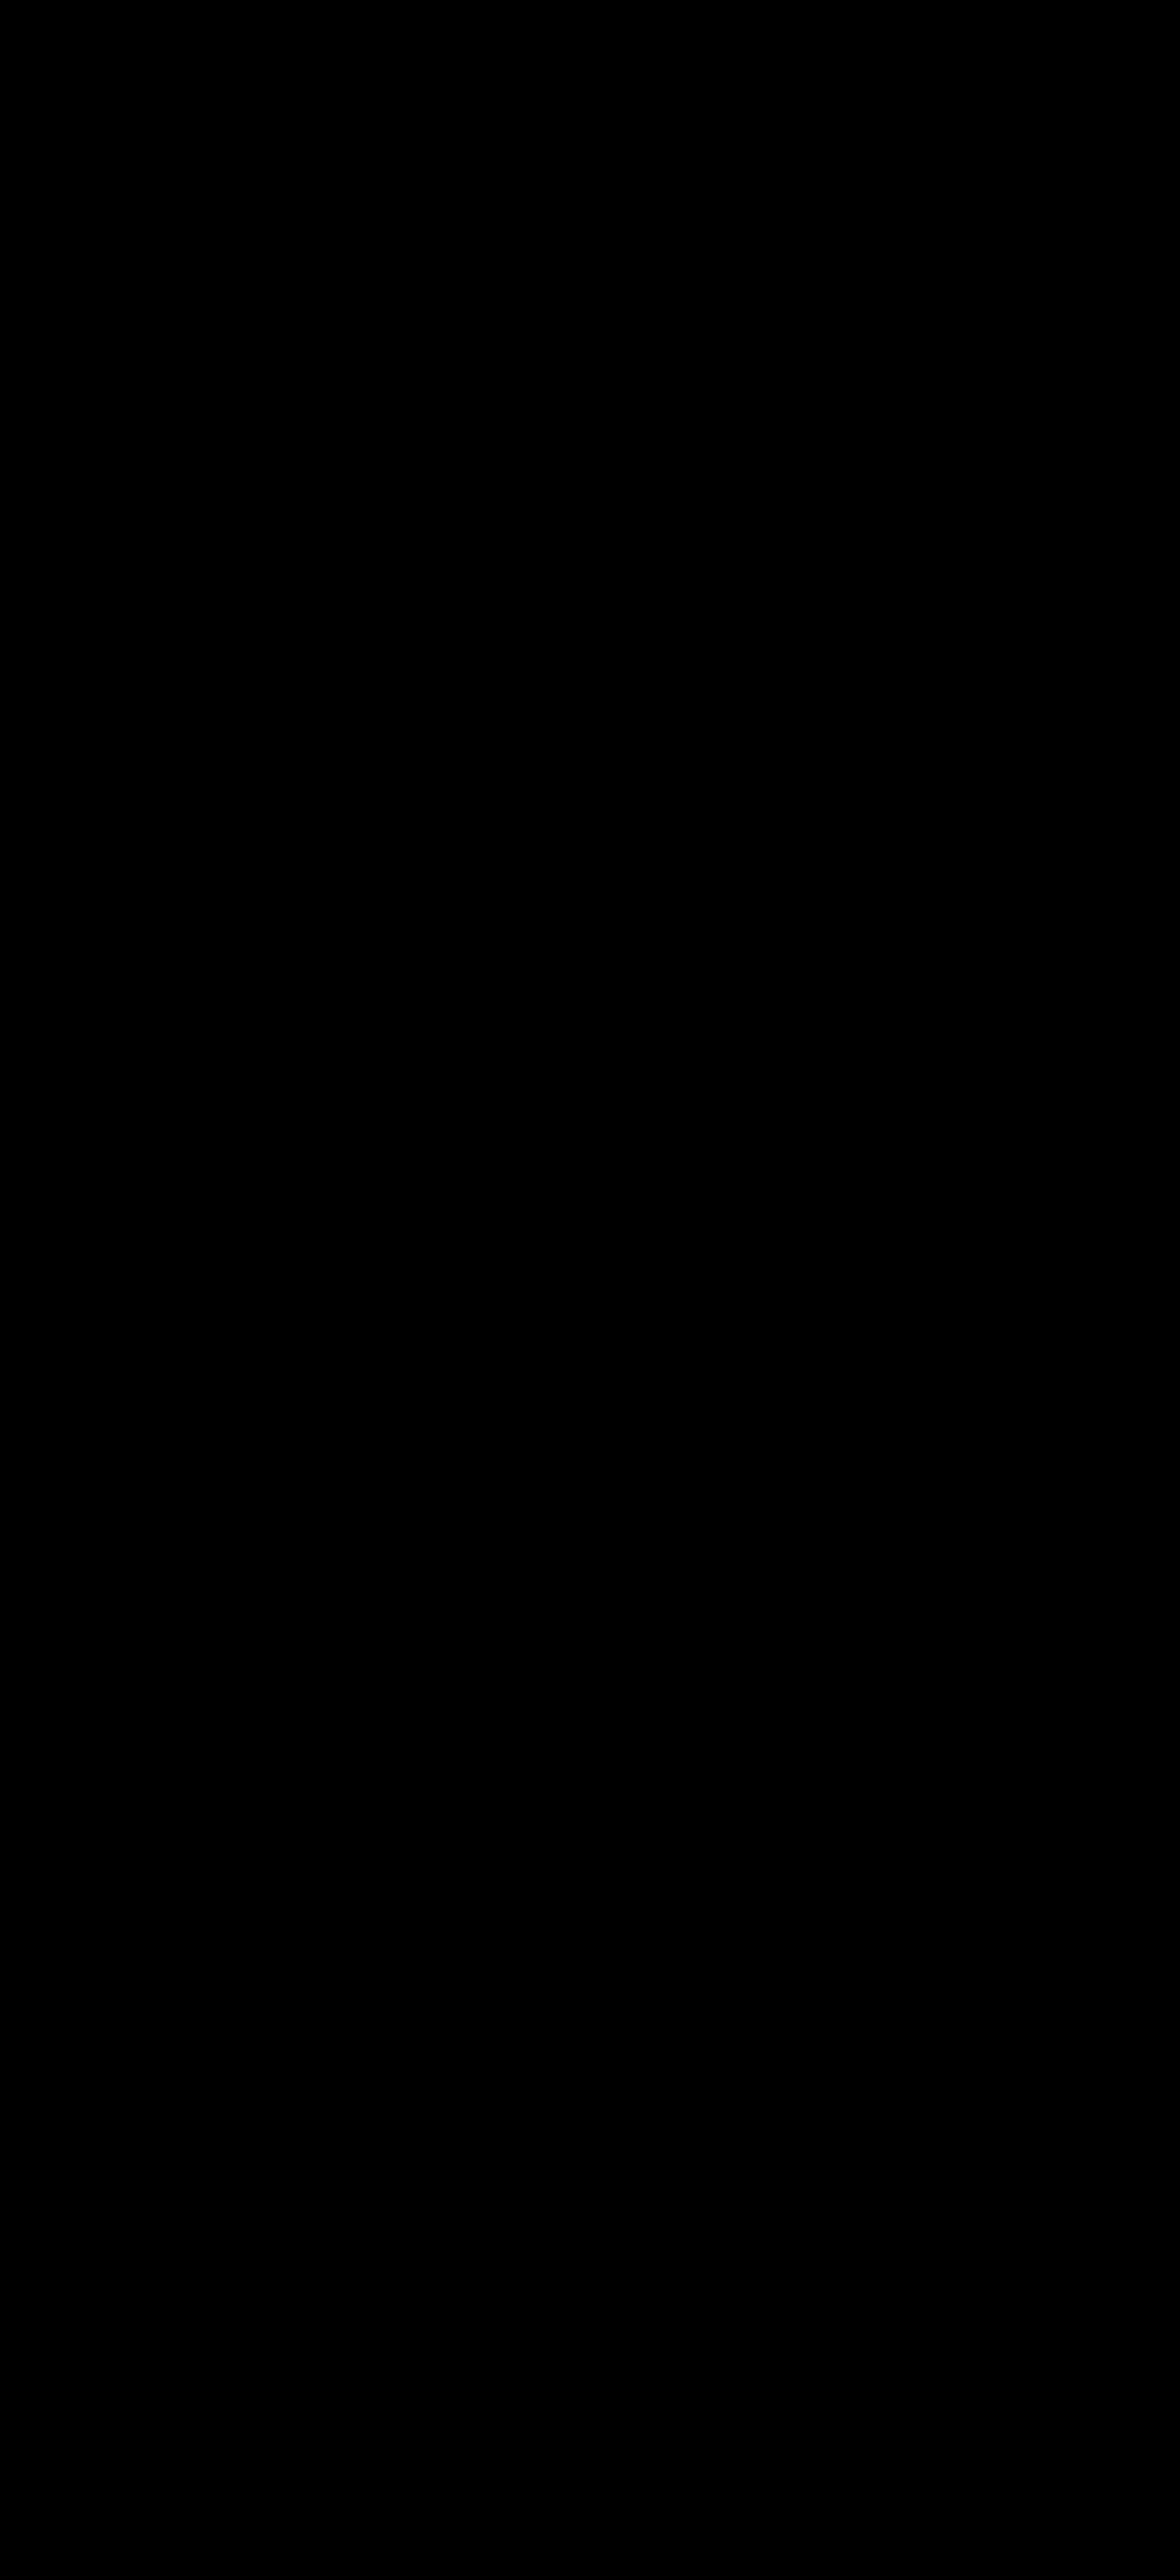 2000x4380 Fileastronaut Rex Walheim Waving (Silhouette).svg